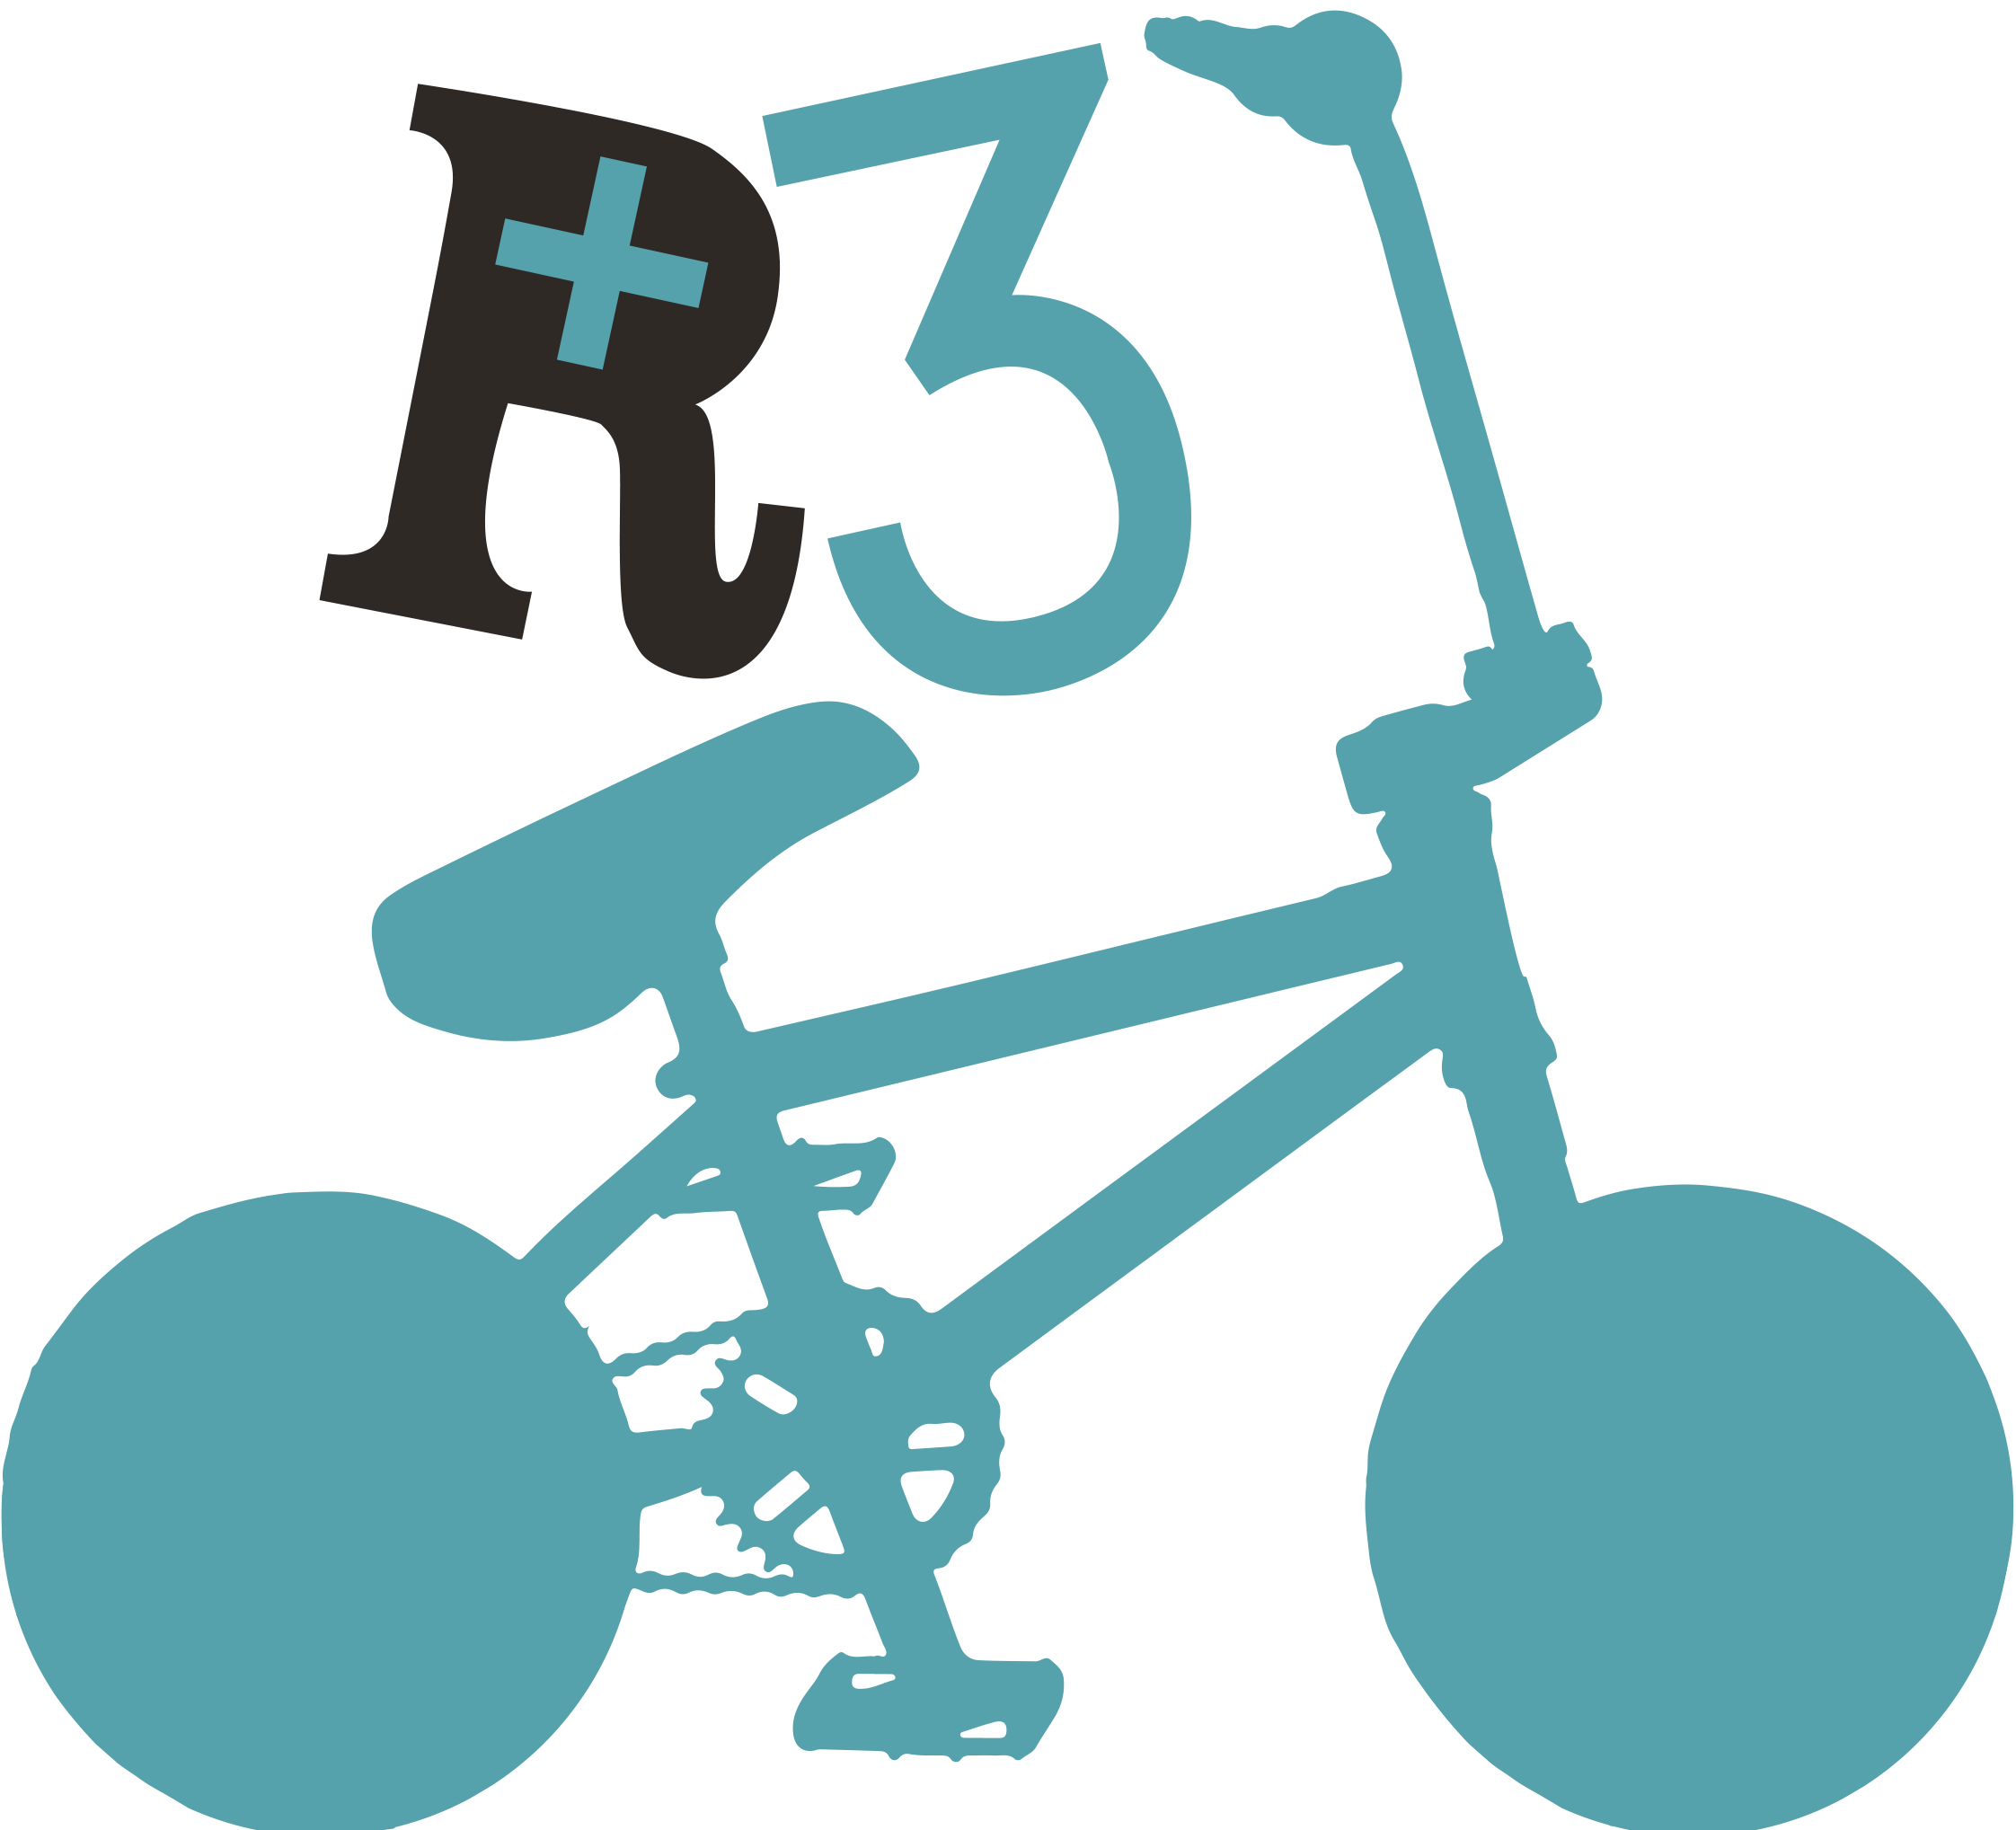 r3-icon3BB8EBAE-3675-5672-1CC2-B9E9D363C4F7.png